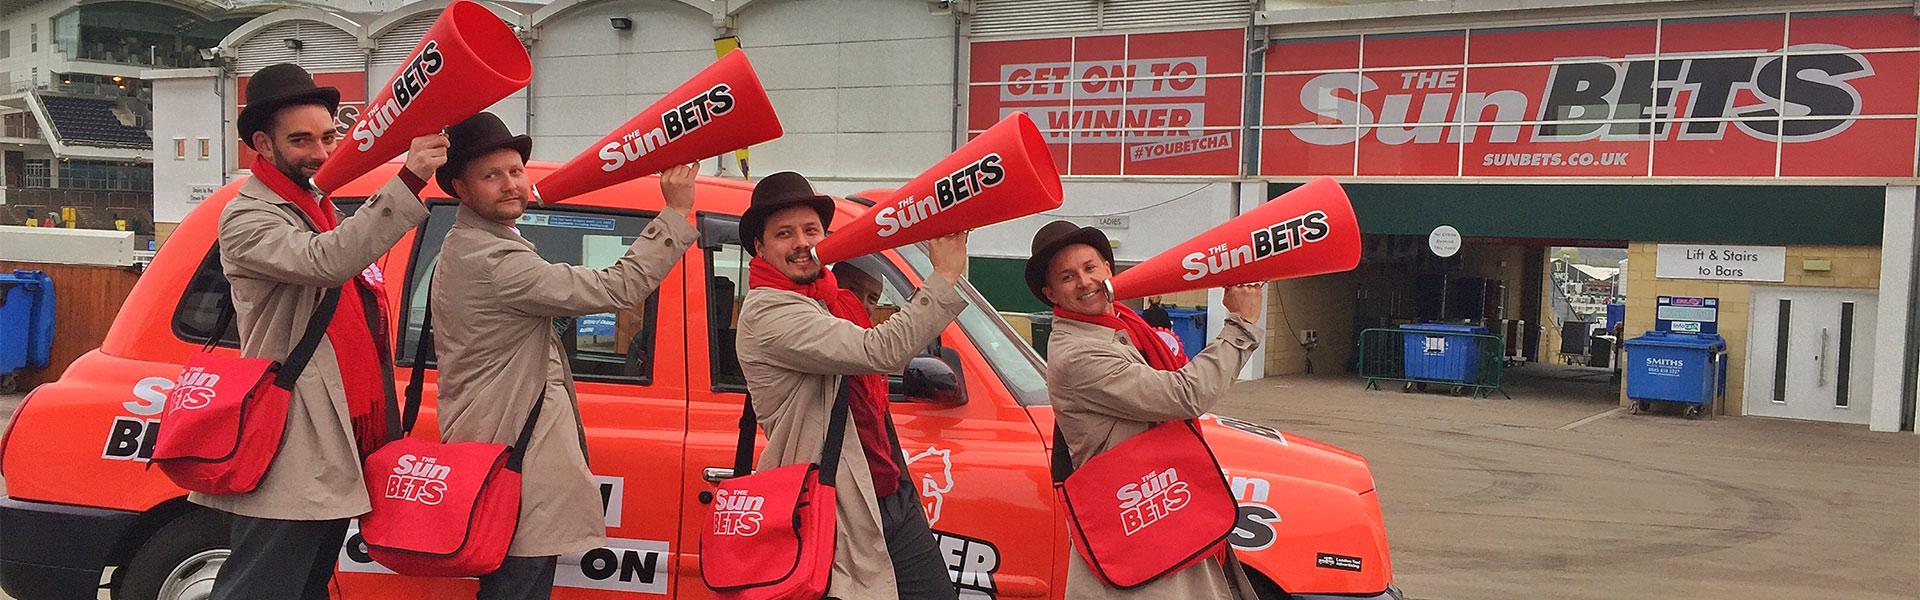 UK wide brand ambassadors